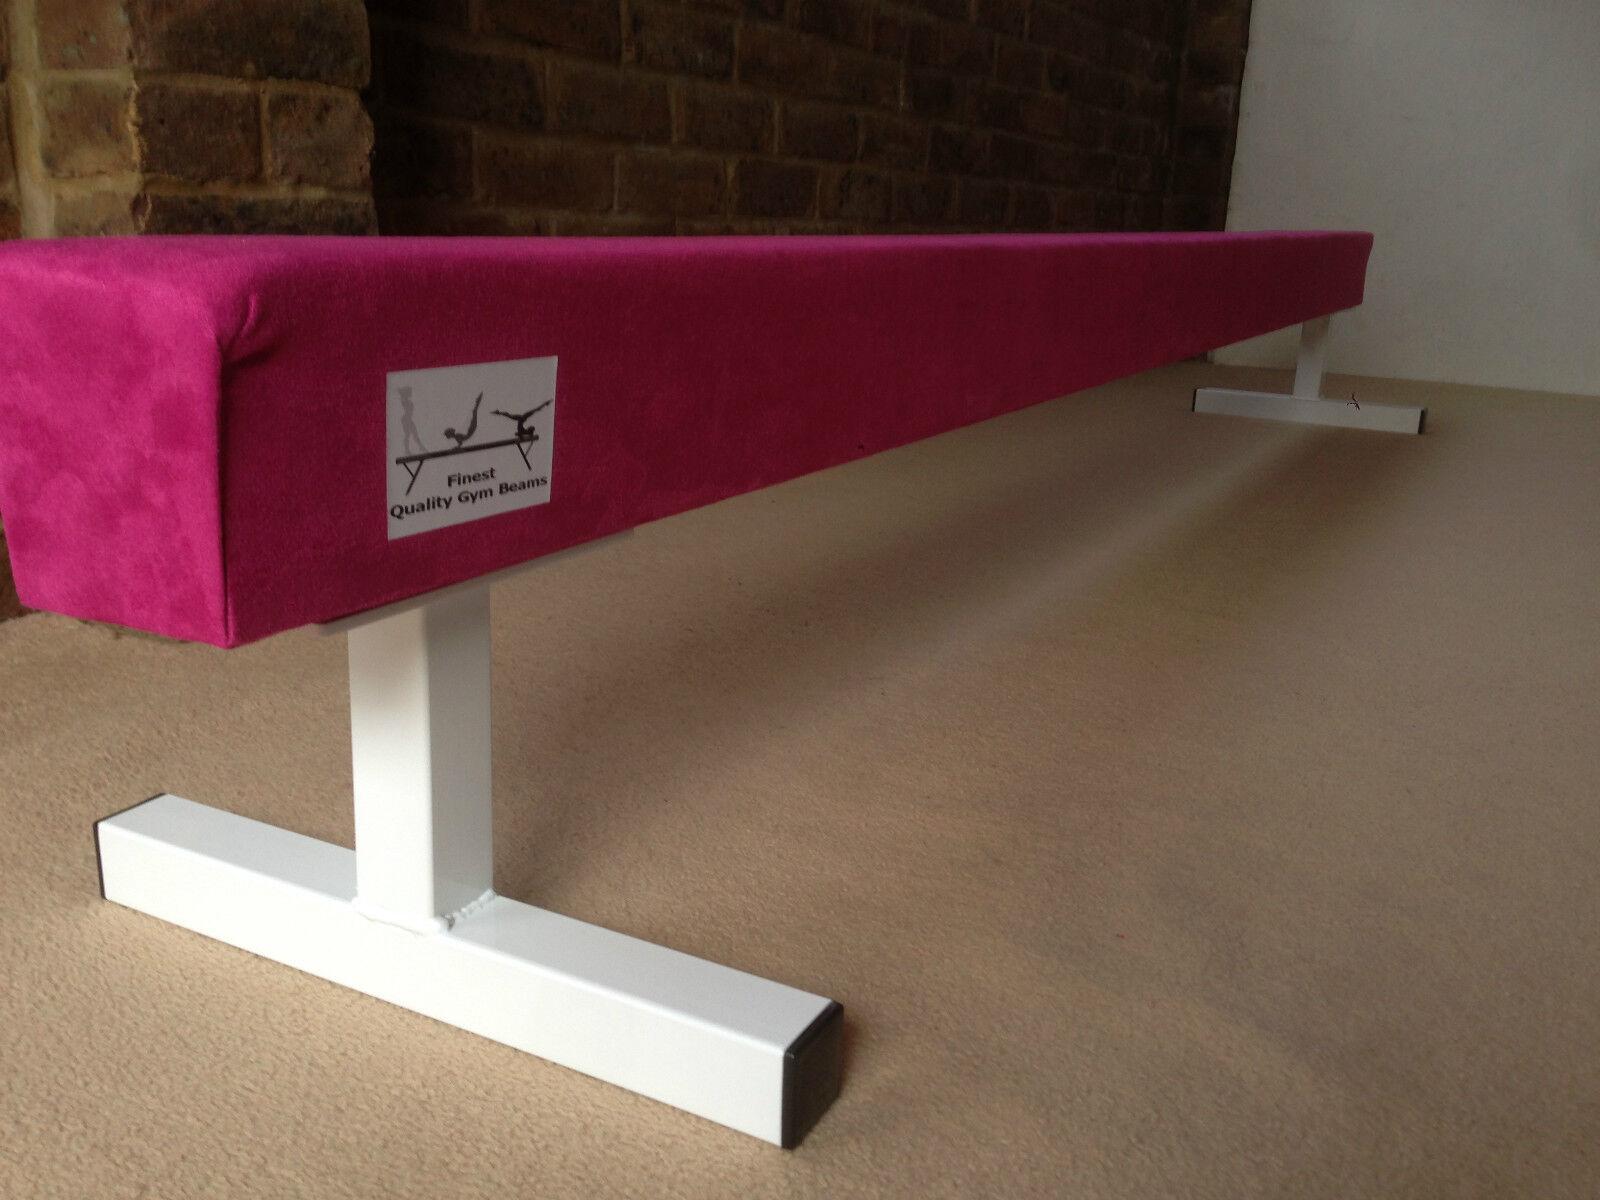 Finest quality HOT PINK gymnastics gym balance beam 10FT long 12  high HOT PINK